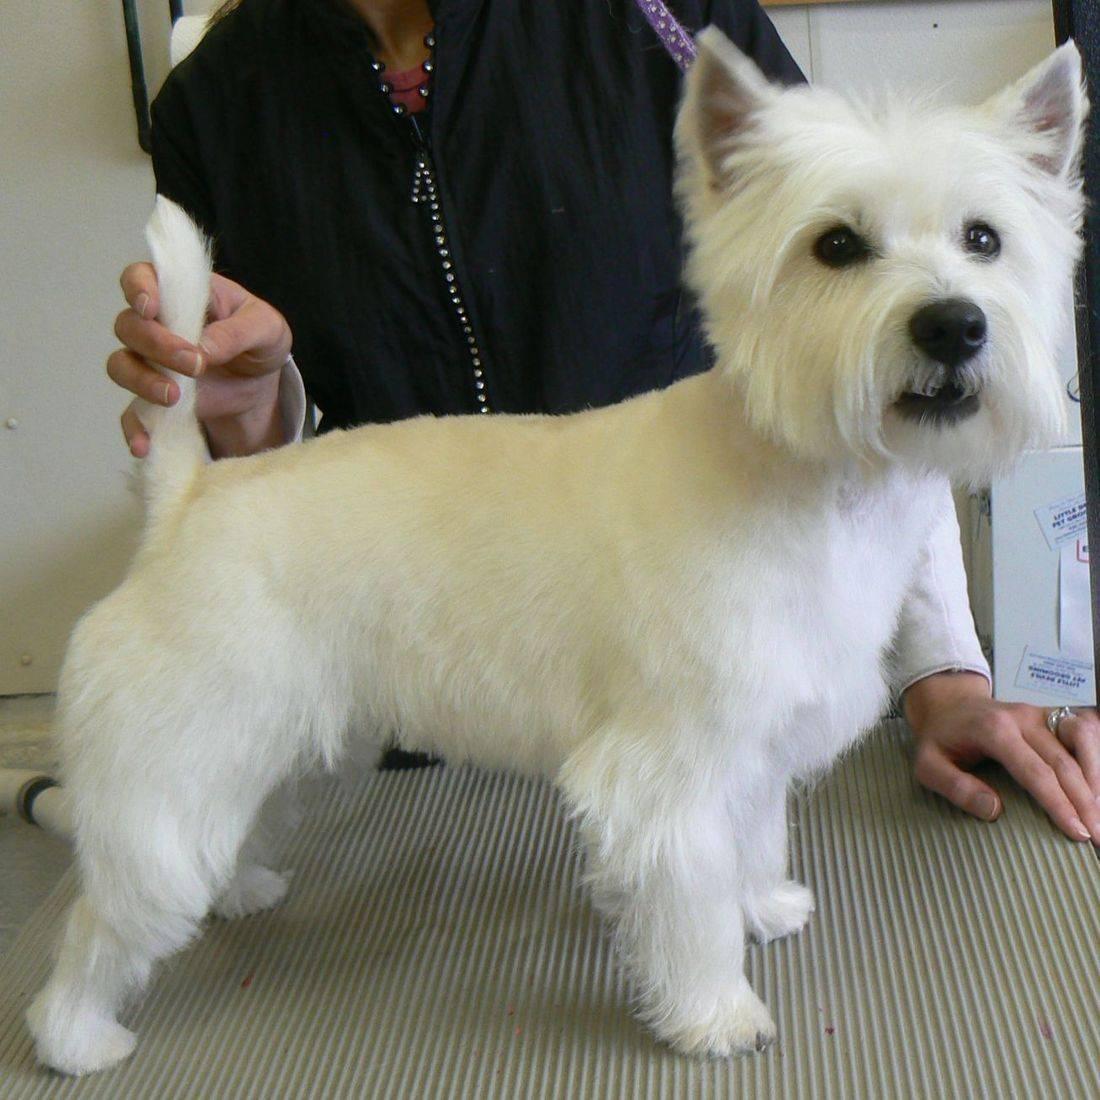 dog groooming details Kimberly Wi Details pet groomer appleton